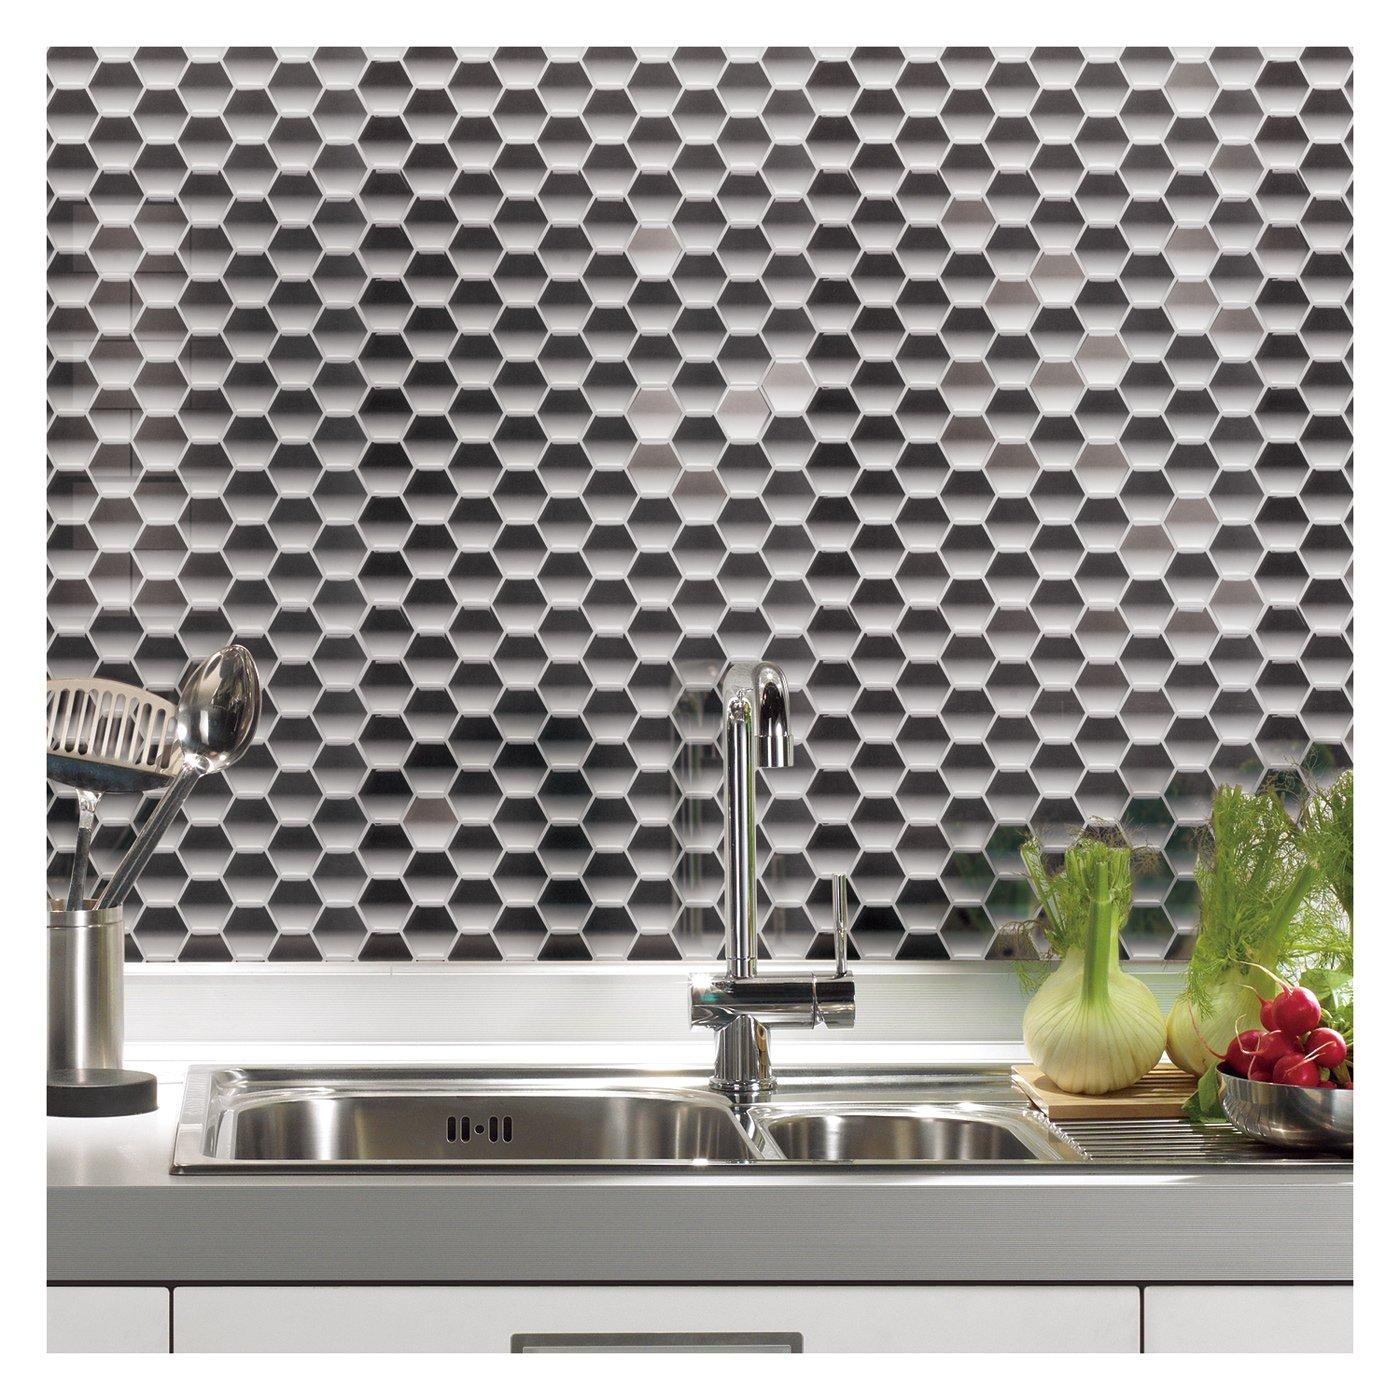 amazon com art3d peel and stick kitchen backsplash wall tile amazon com art3d peel and stick kitchen backsplash wall tile hexagon design 6 sheets home kitchen